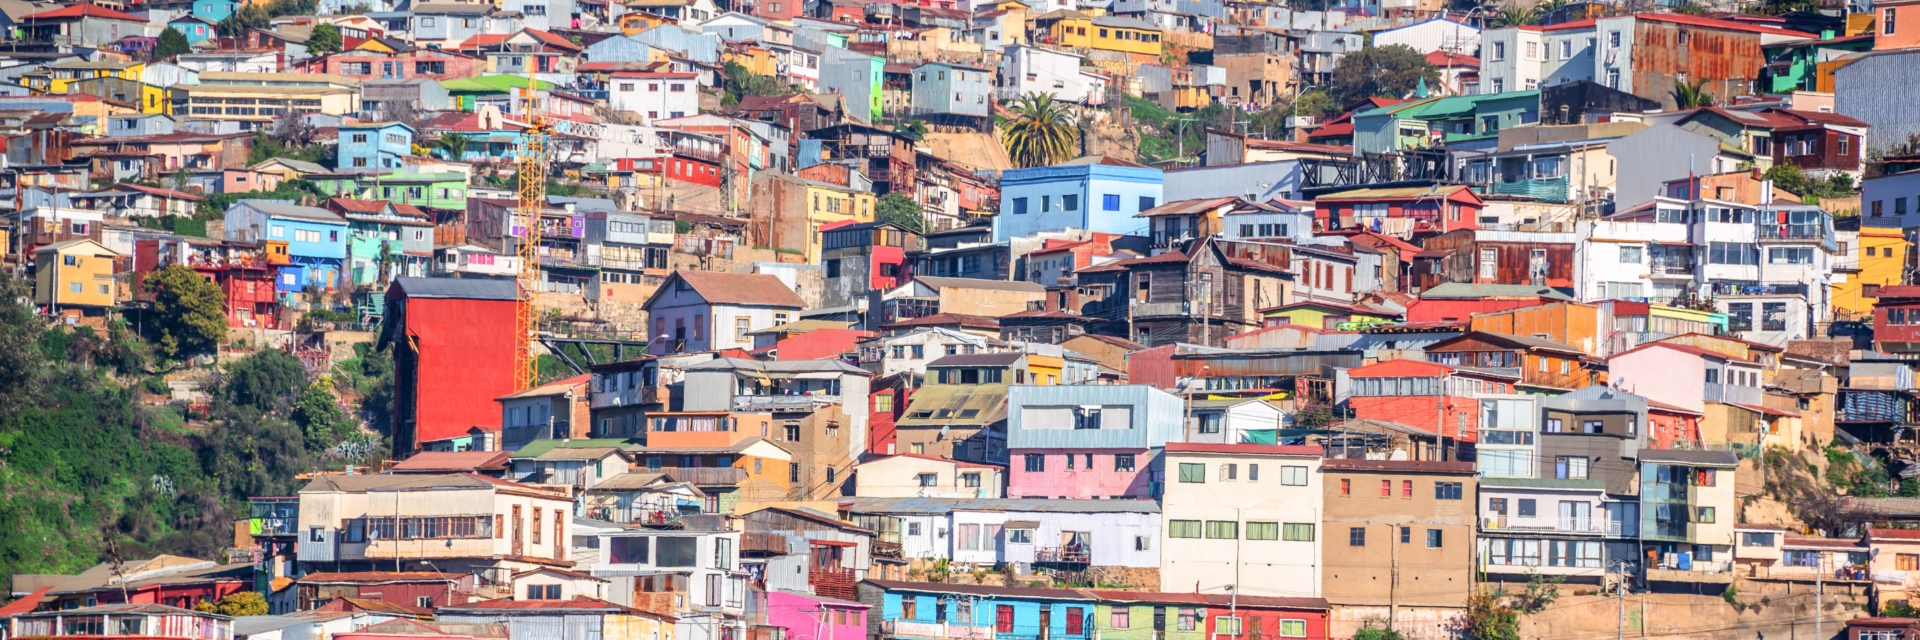 maisons-valparaiso